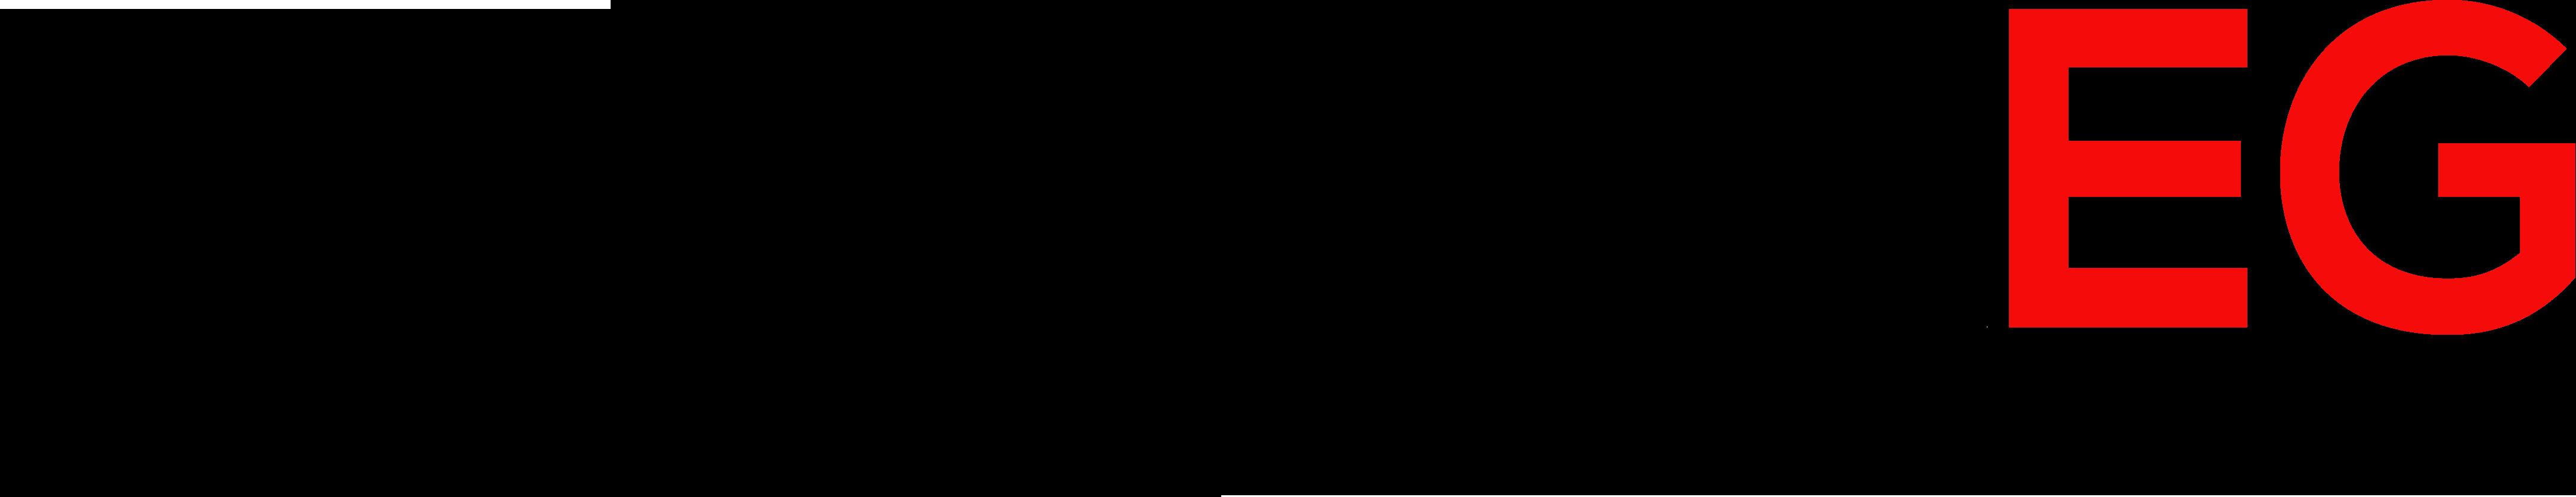 BARISTA EG